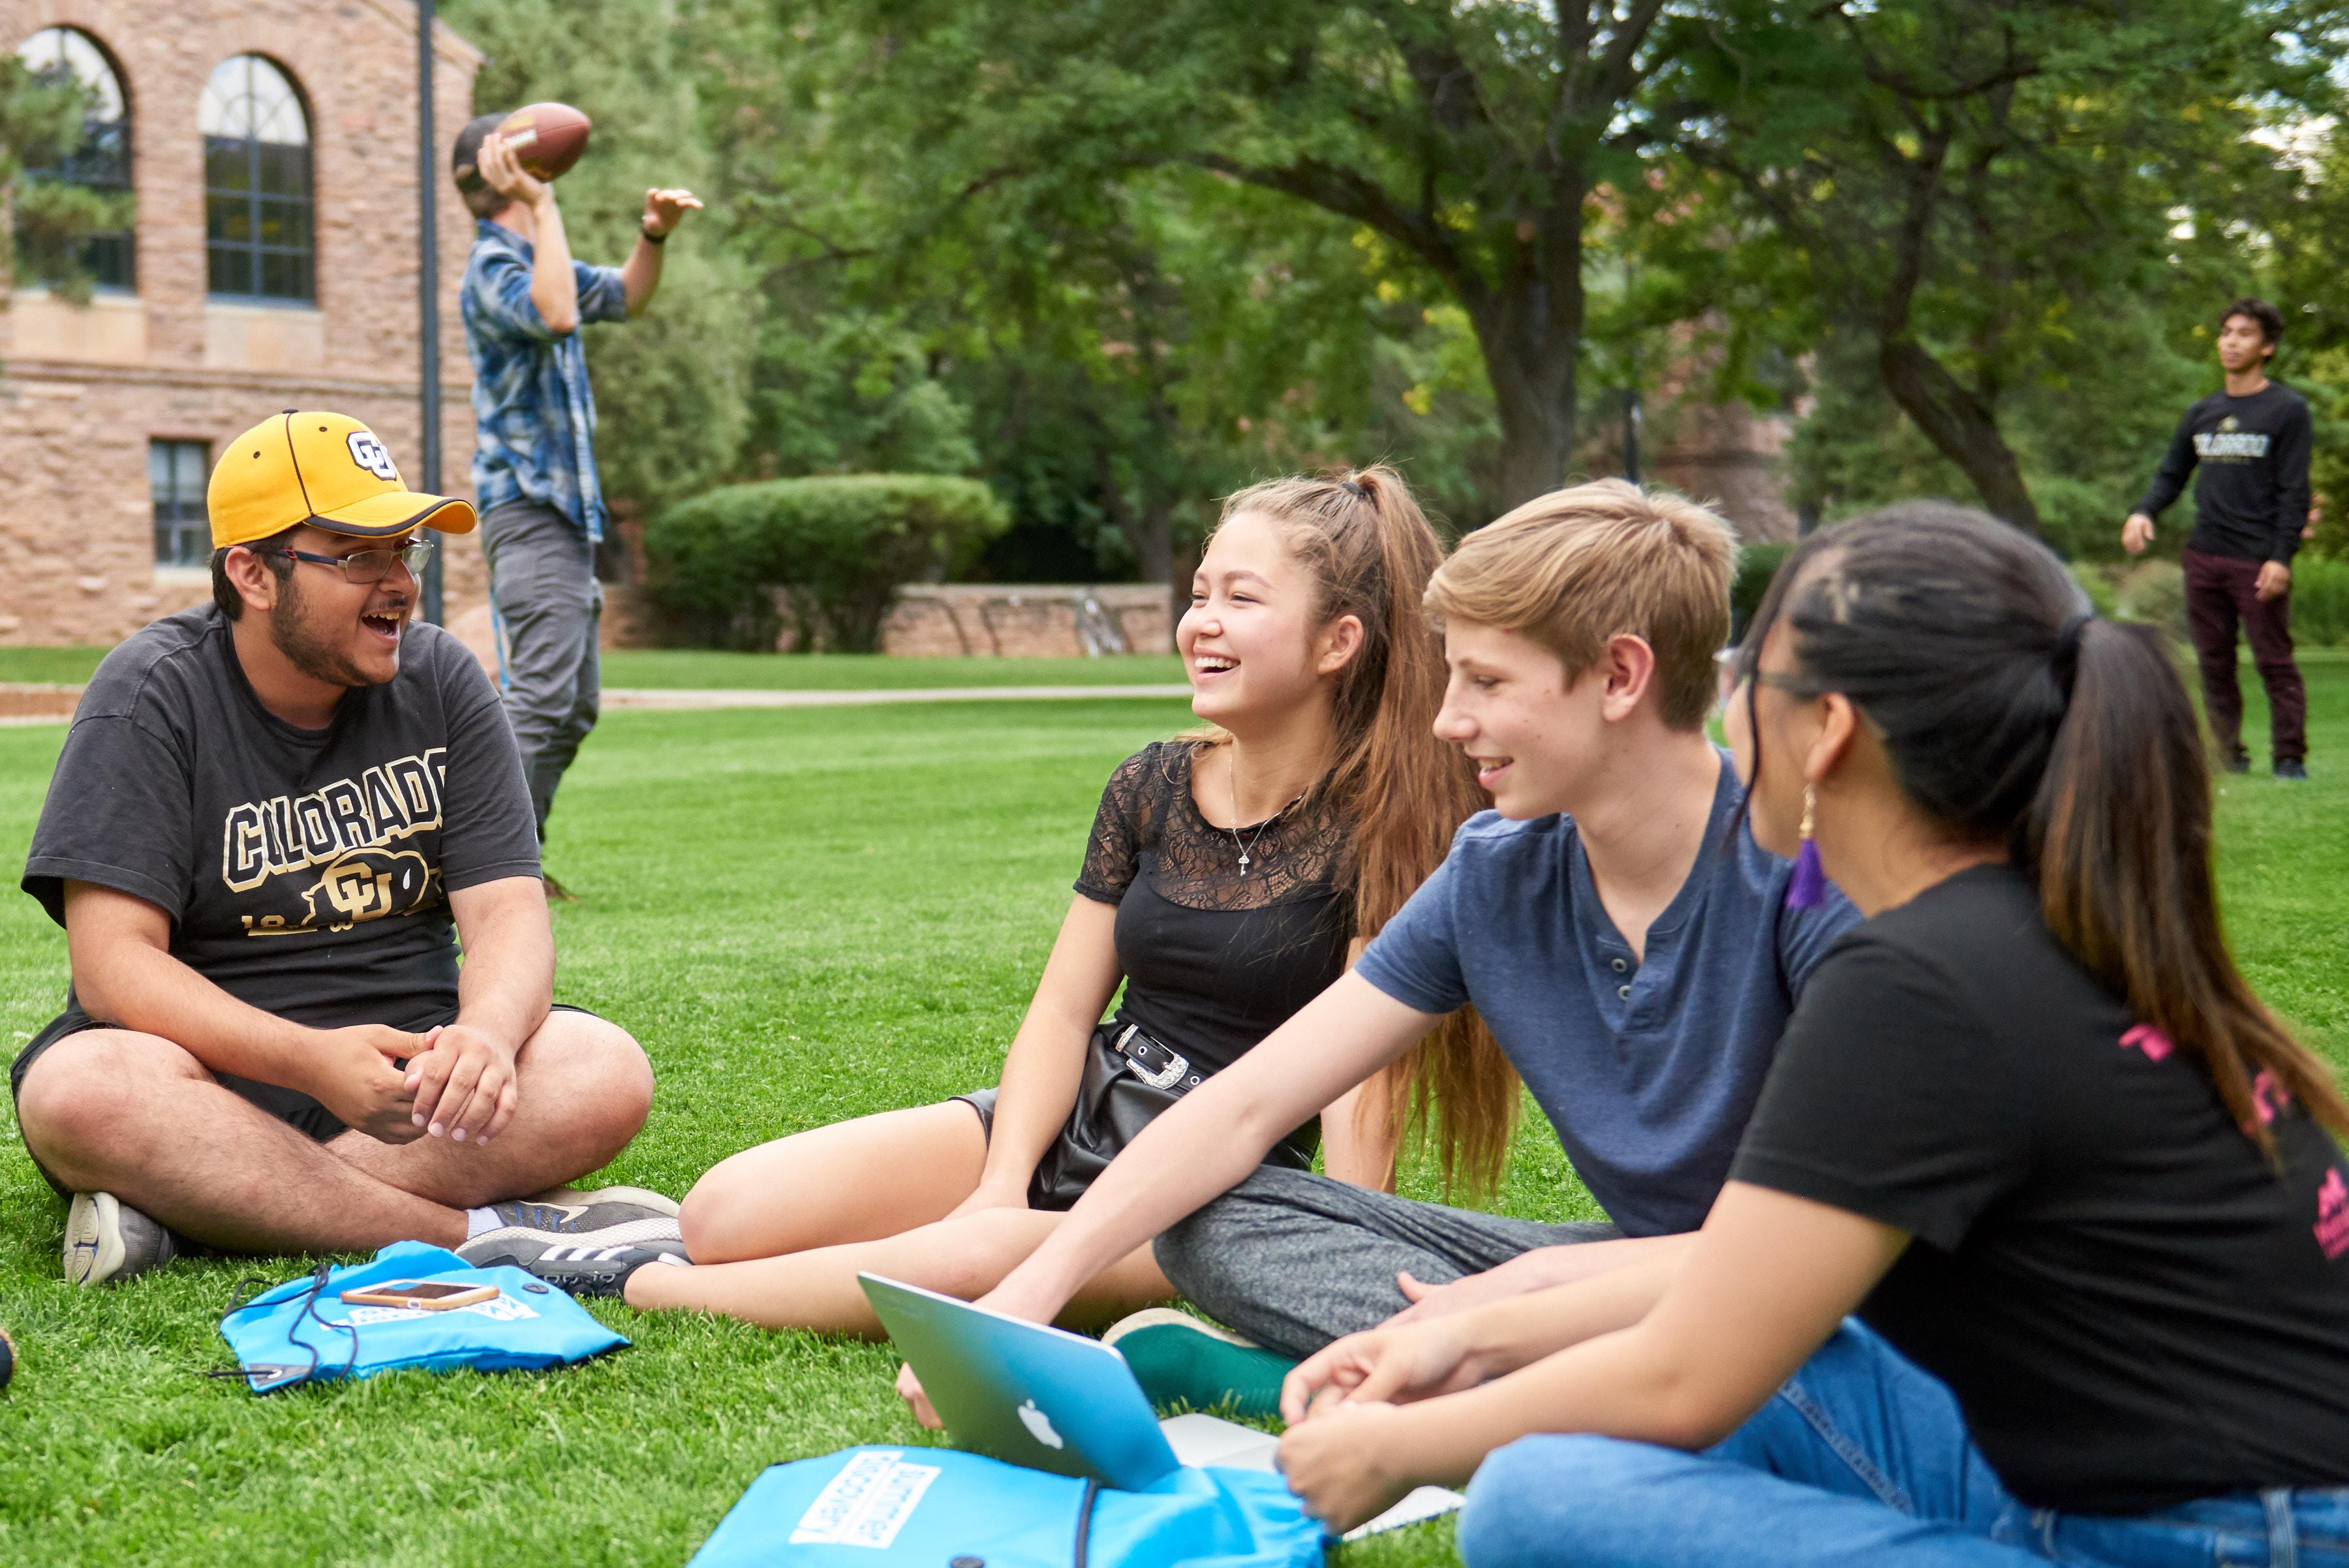 Summer Program - Coding | Summer Discovery: University of Colorado Boulder - STEM